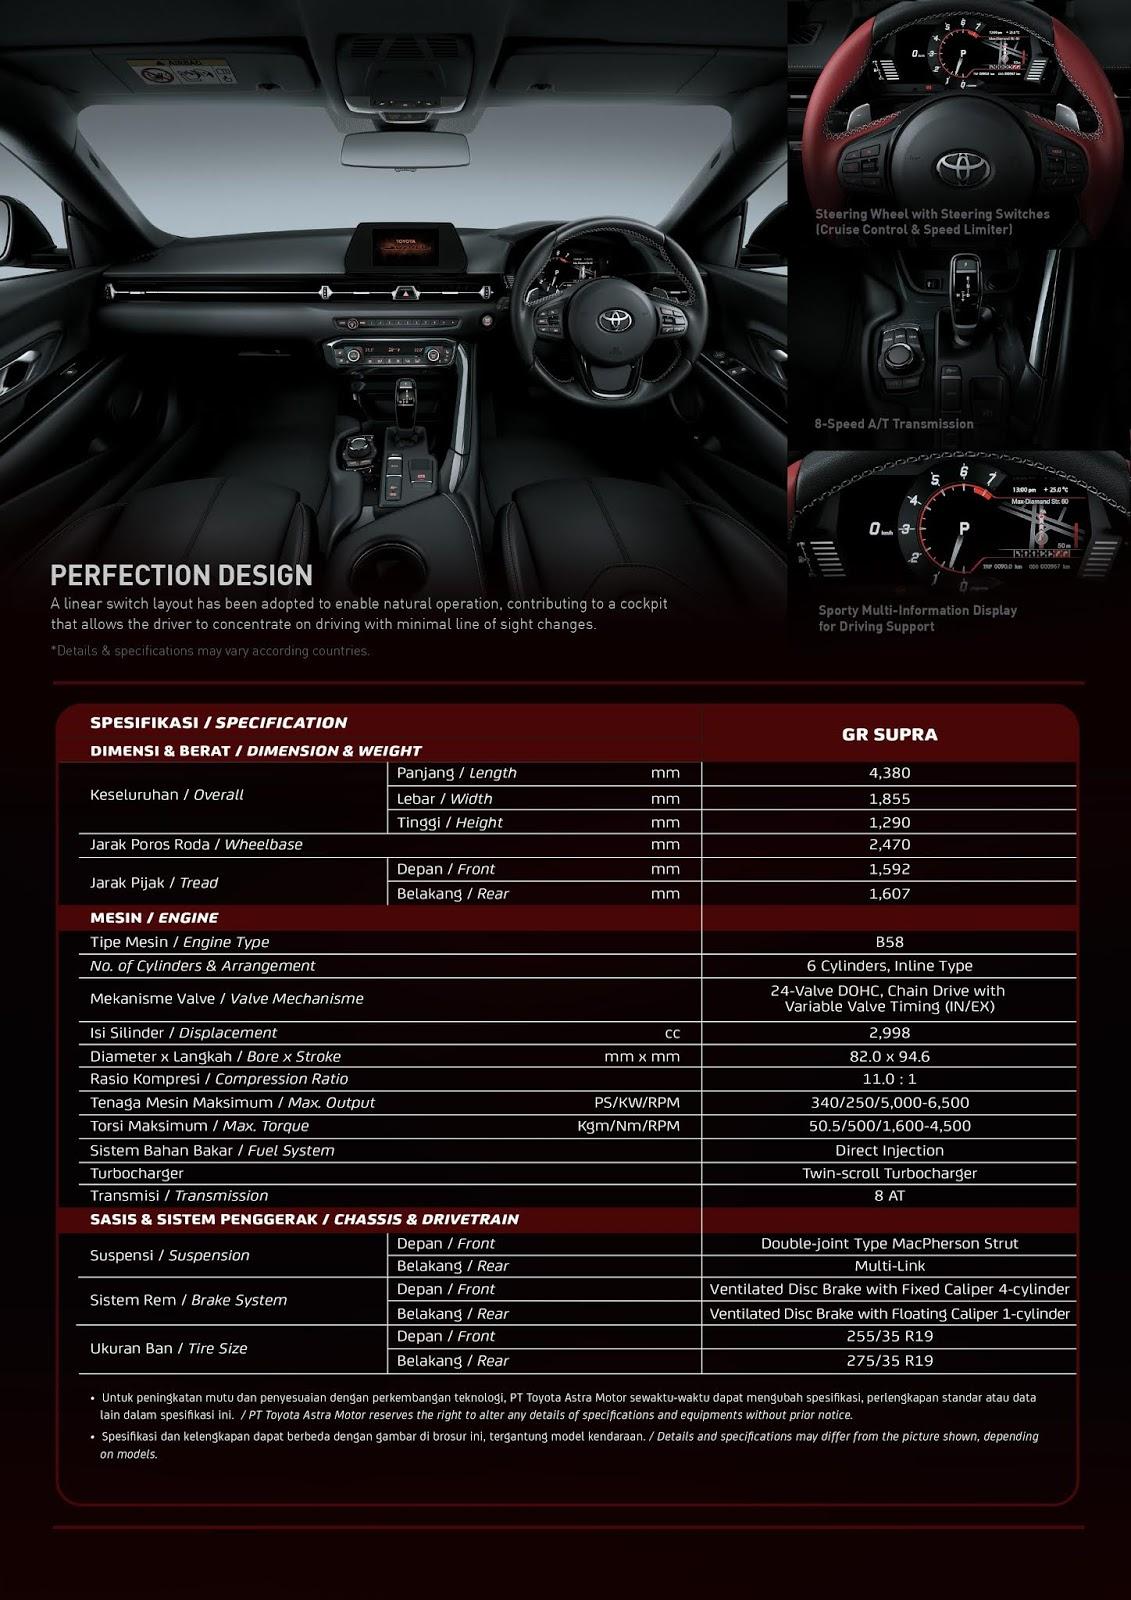 New Supra - Info Spesifikasi, Harga Toyota Supra Bali & Promo Toyota Supra Bali